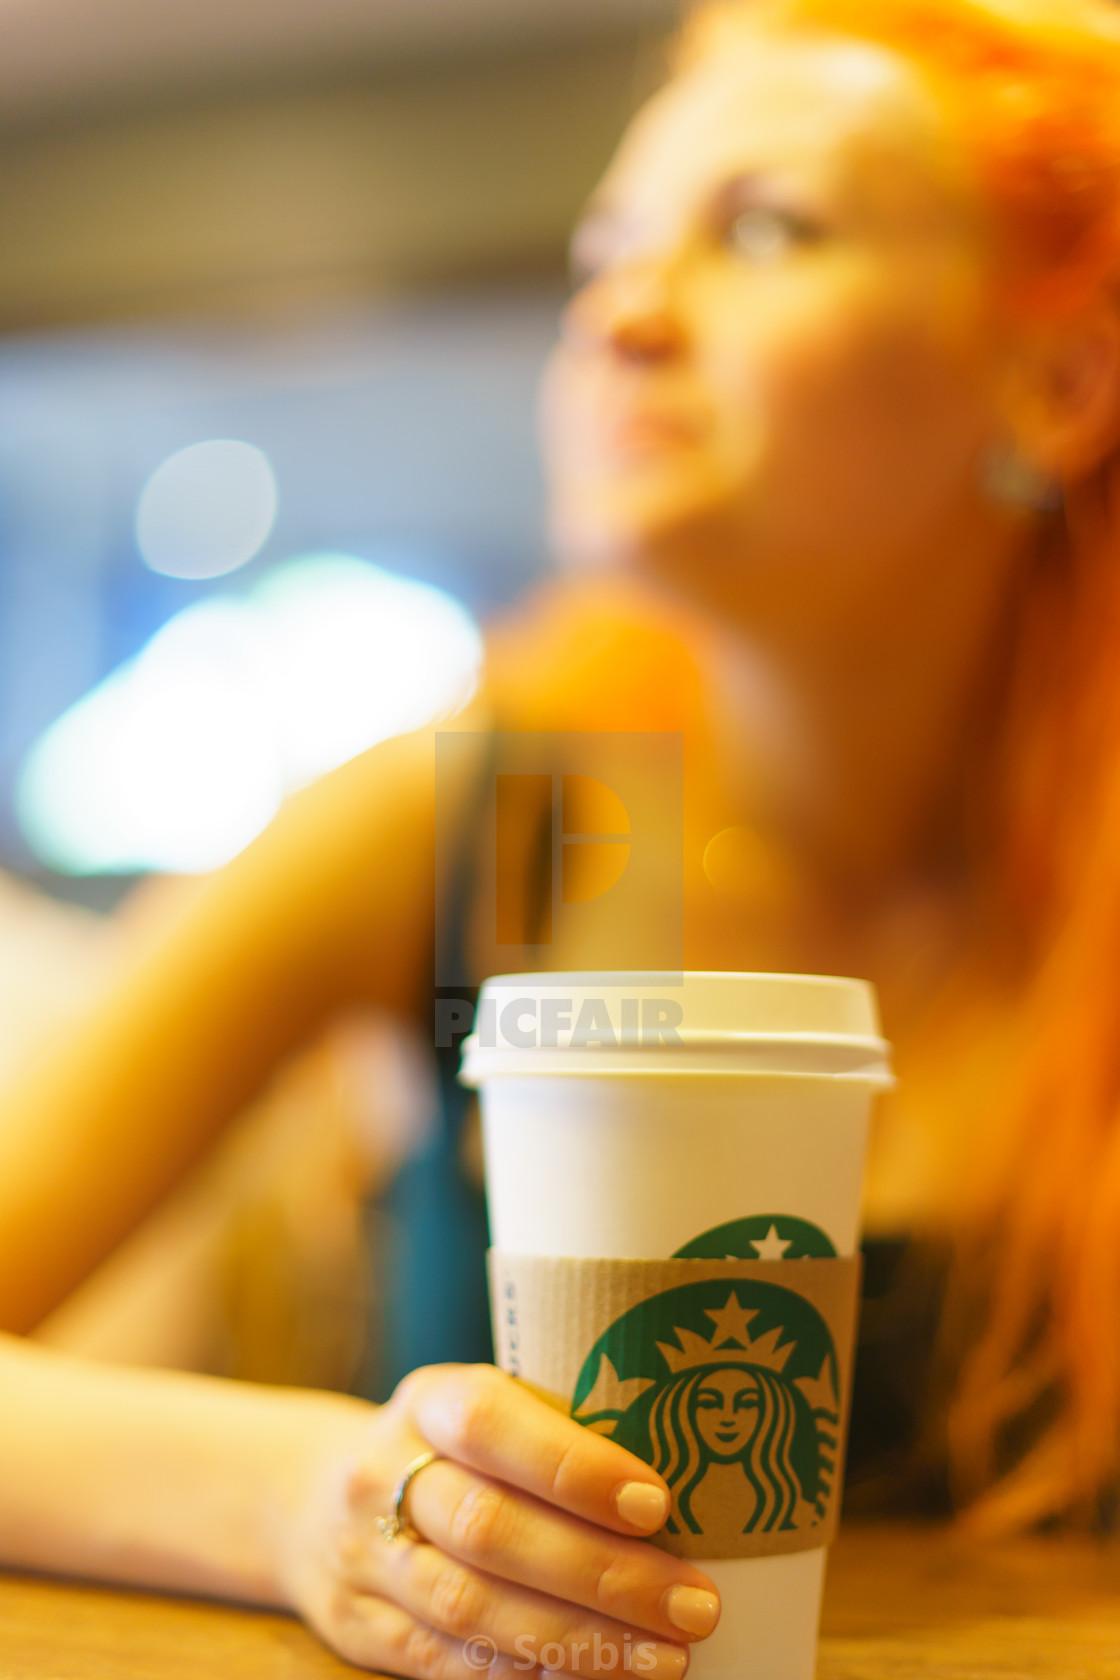 Starbucks dating